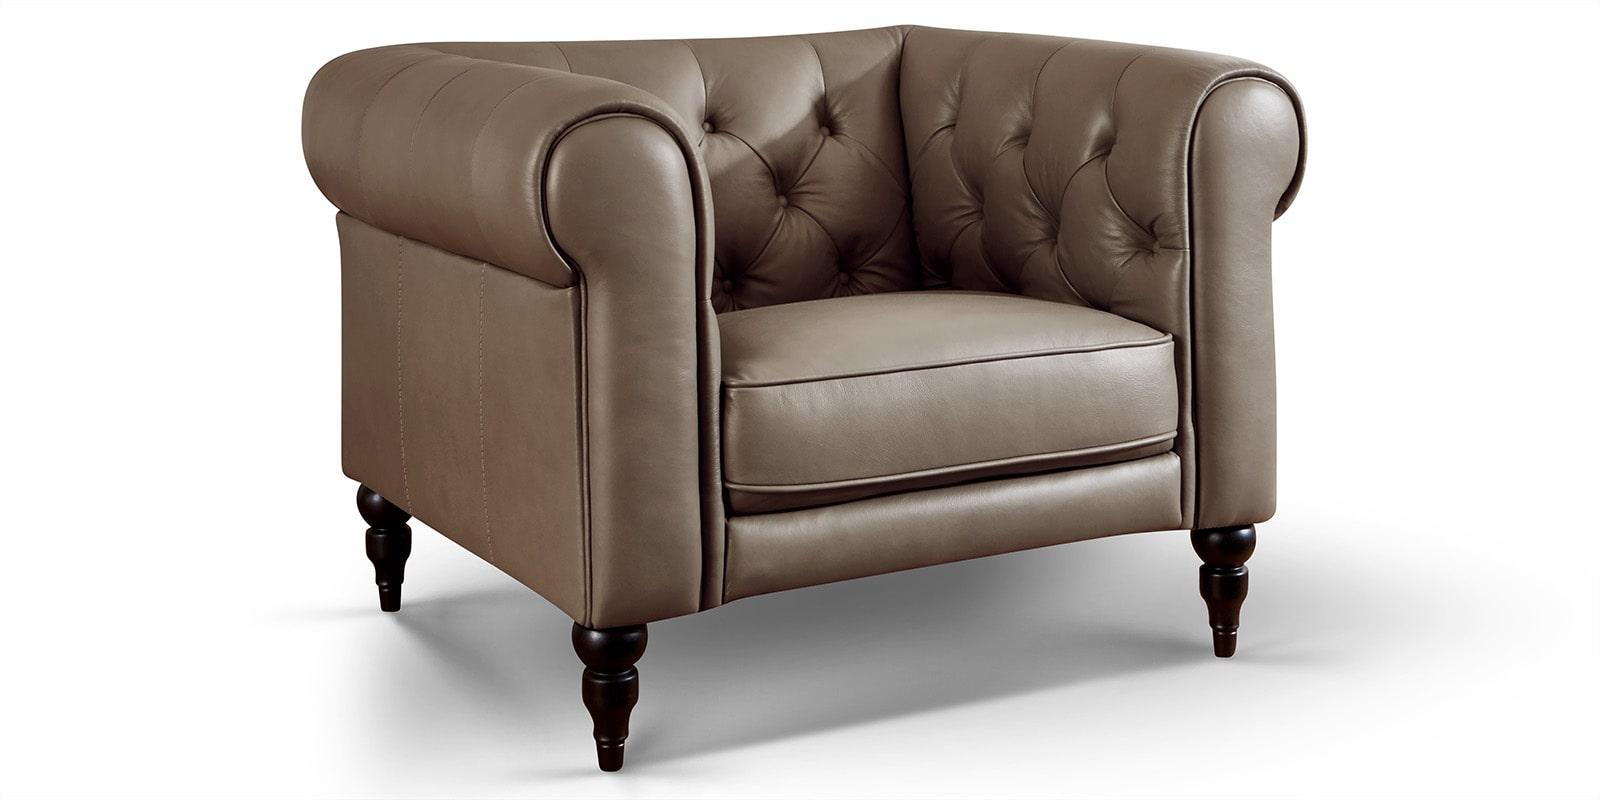 1-Sitzer Chesterfield Sessel Ledersofa Hudson taupe